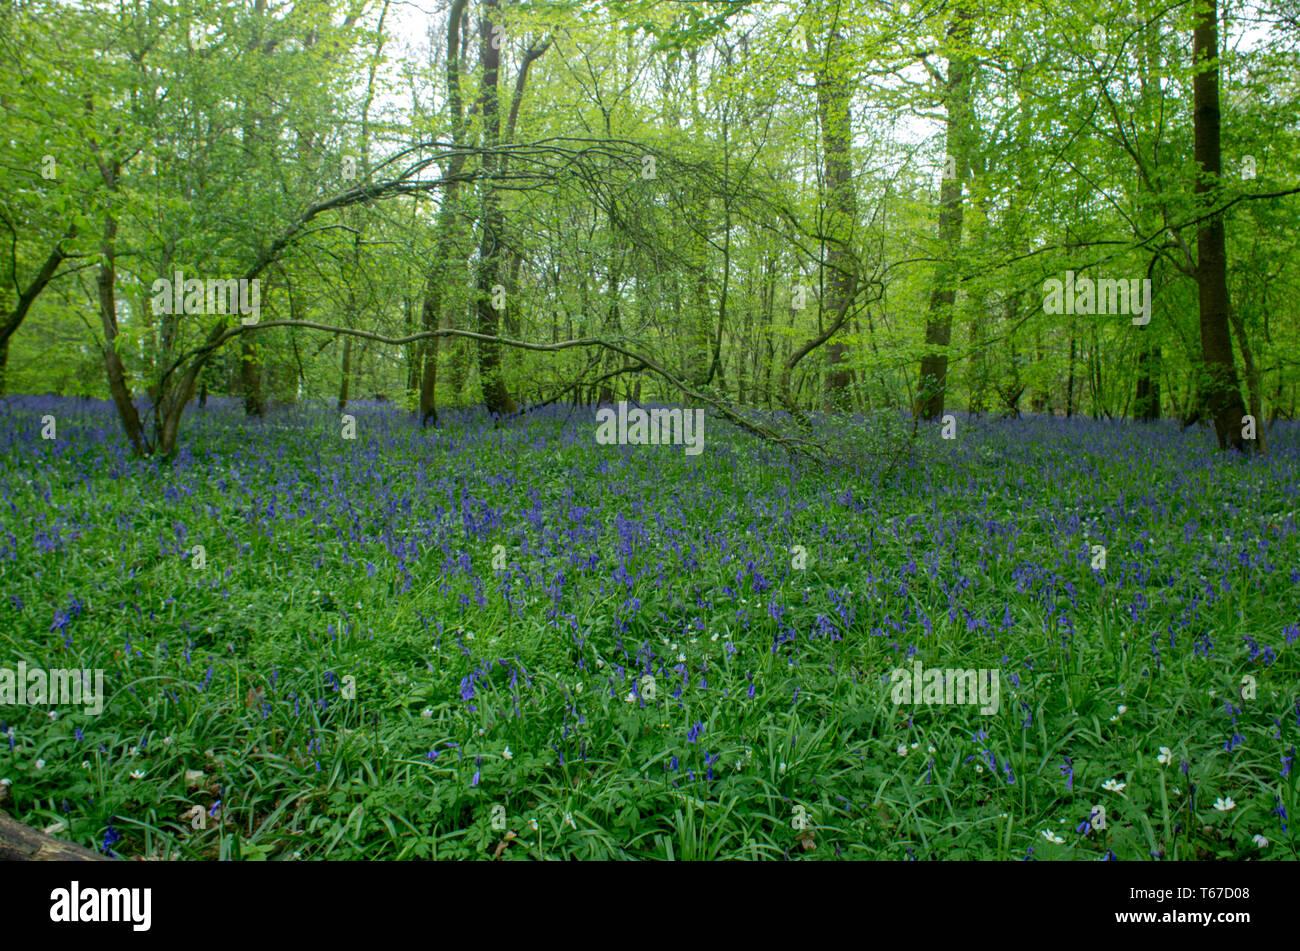 Spring bluebells (hyacinthoid) carpet the woodland floor - Stock Image